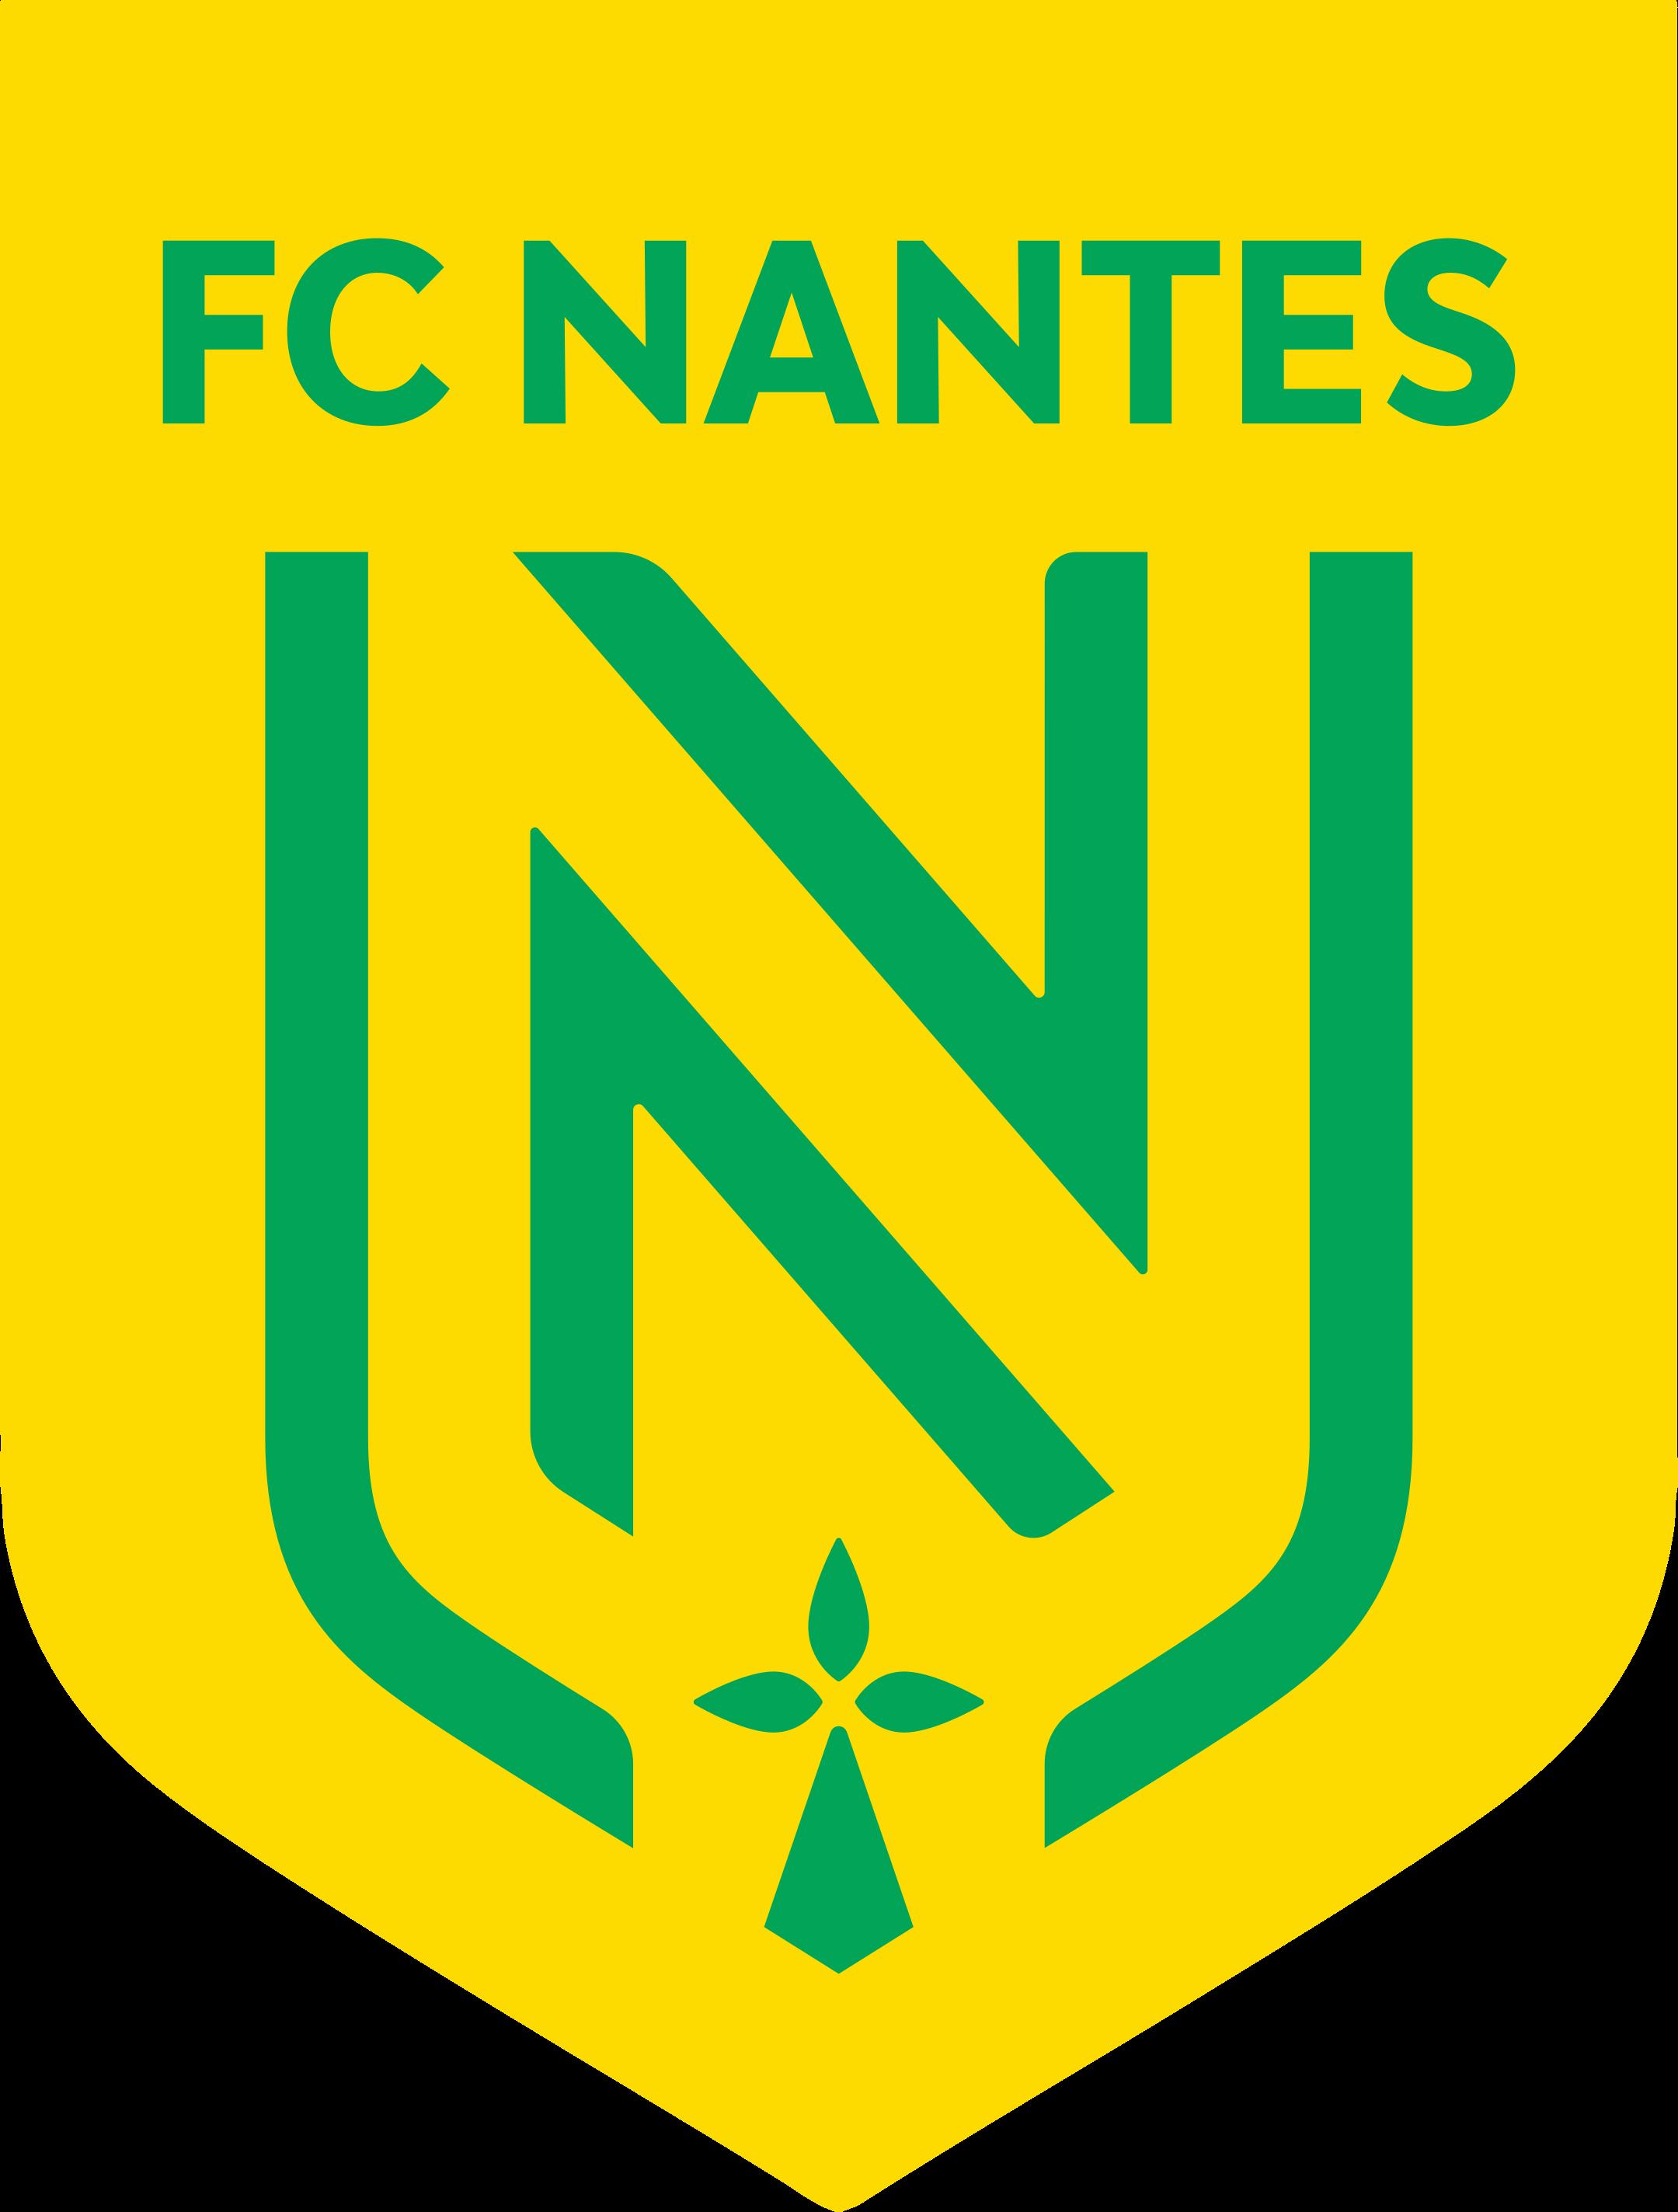 nantes fc logo 1 - FC Nantes Logo